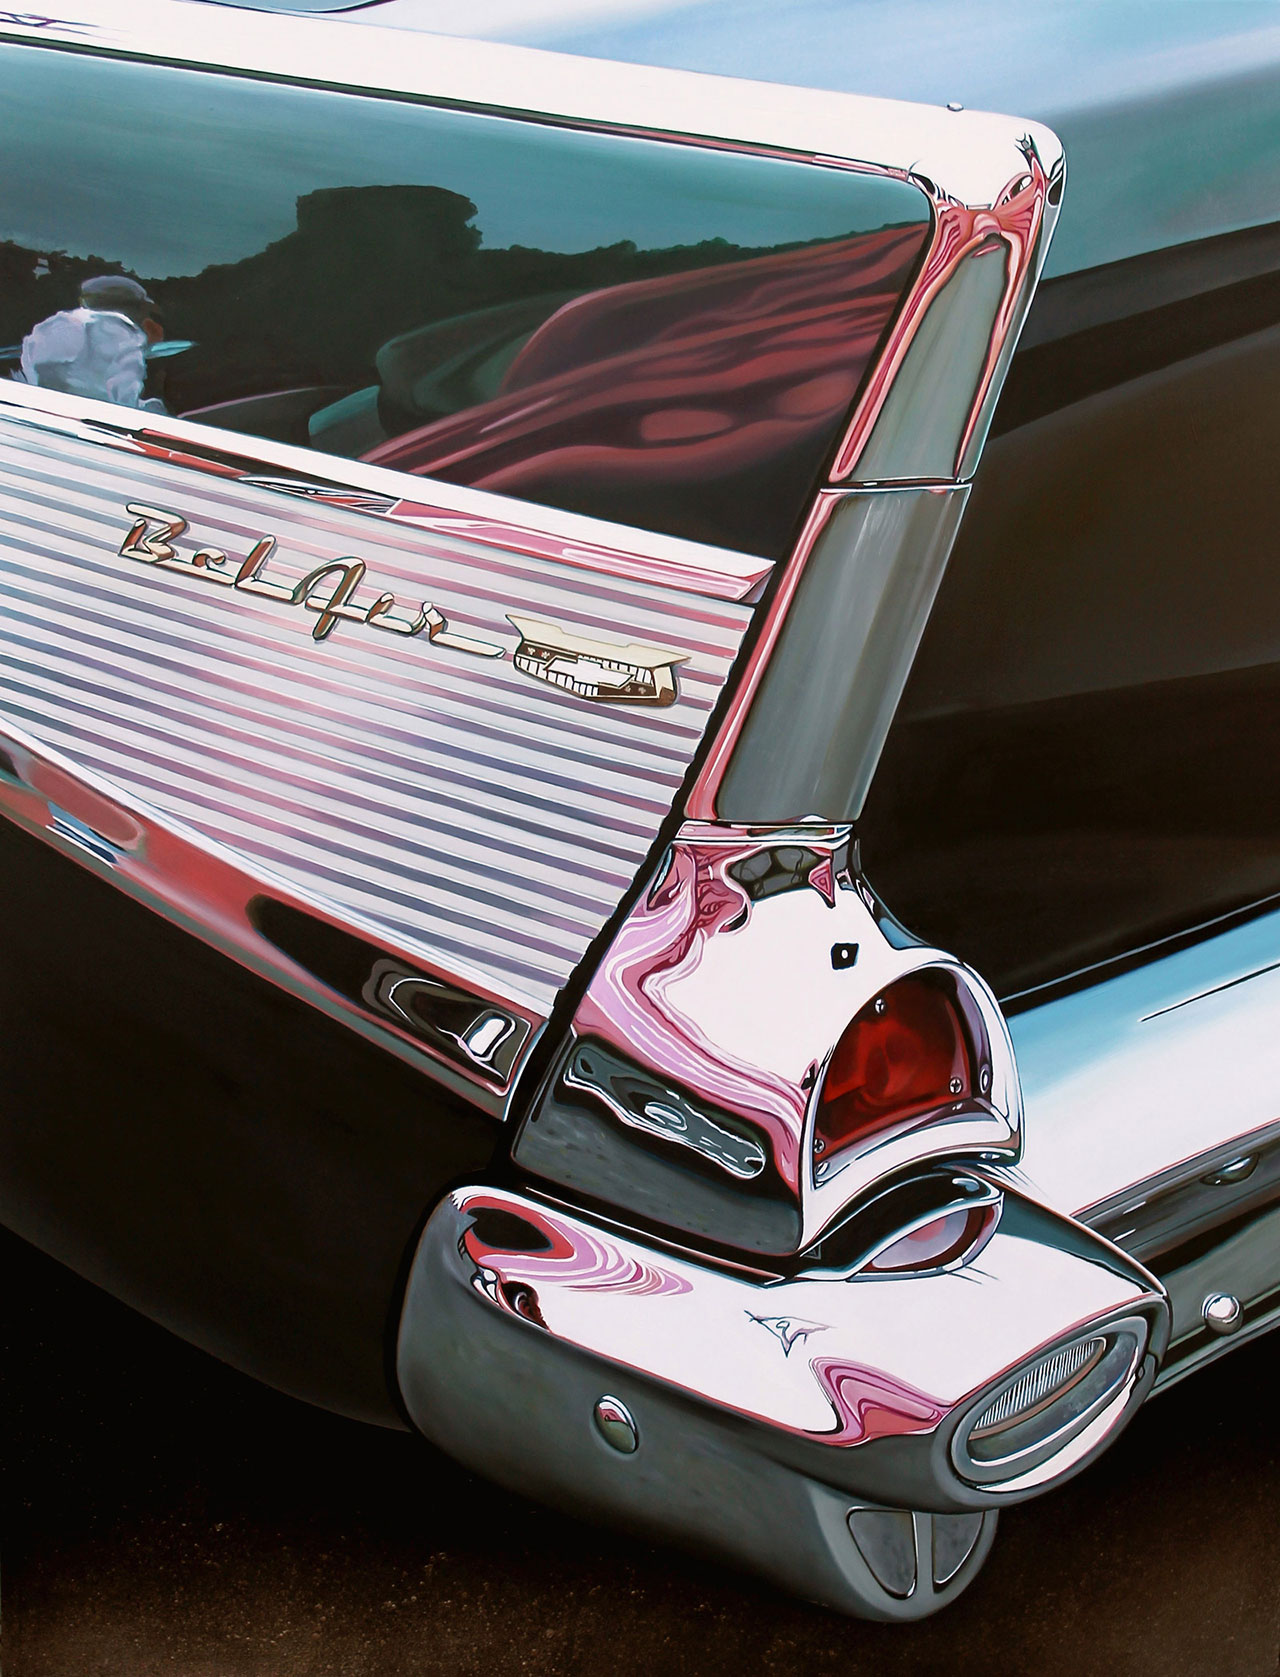 "Bel Air with Pink, 2013 oil on aluminum panel, 23 x 30""© Cheryl Kelley, Courtesy of Bernarducci Meisel Gallery"